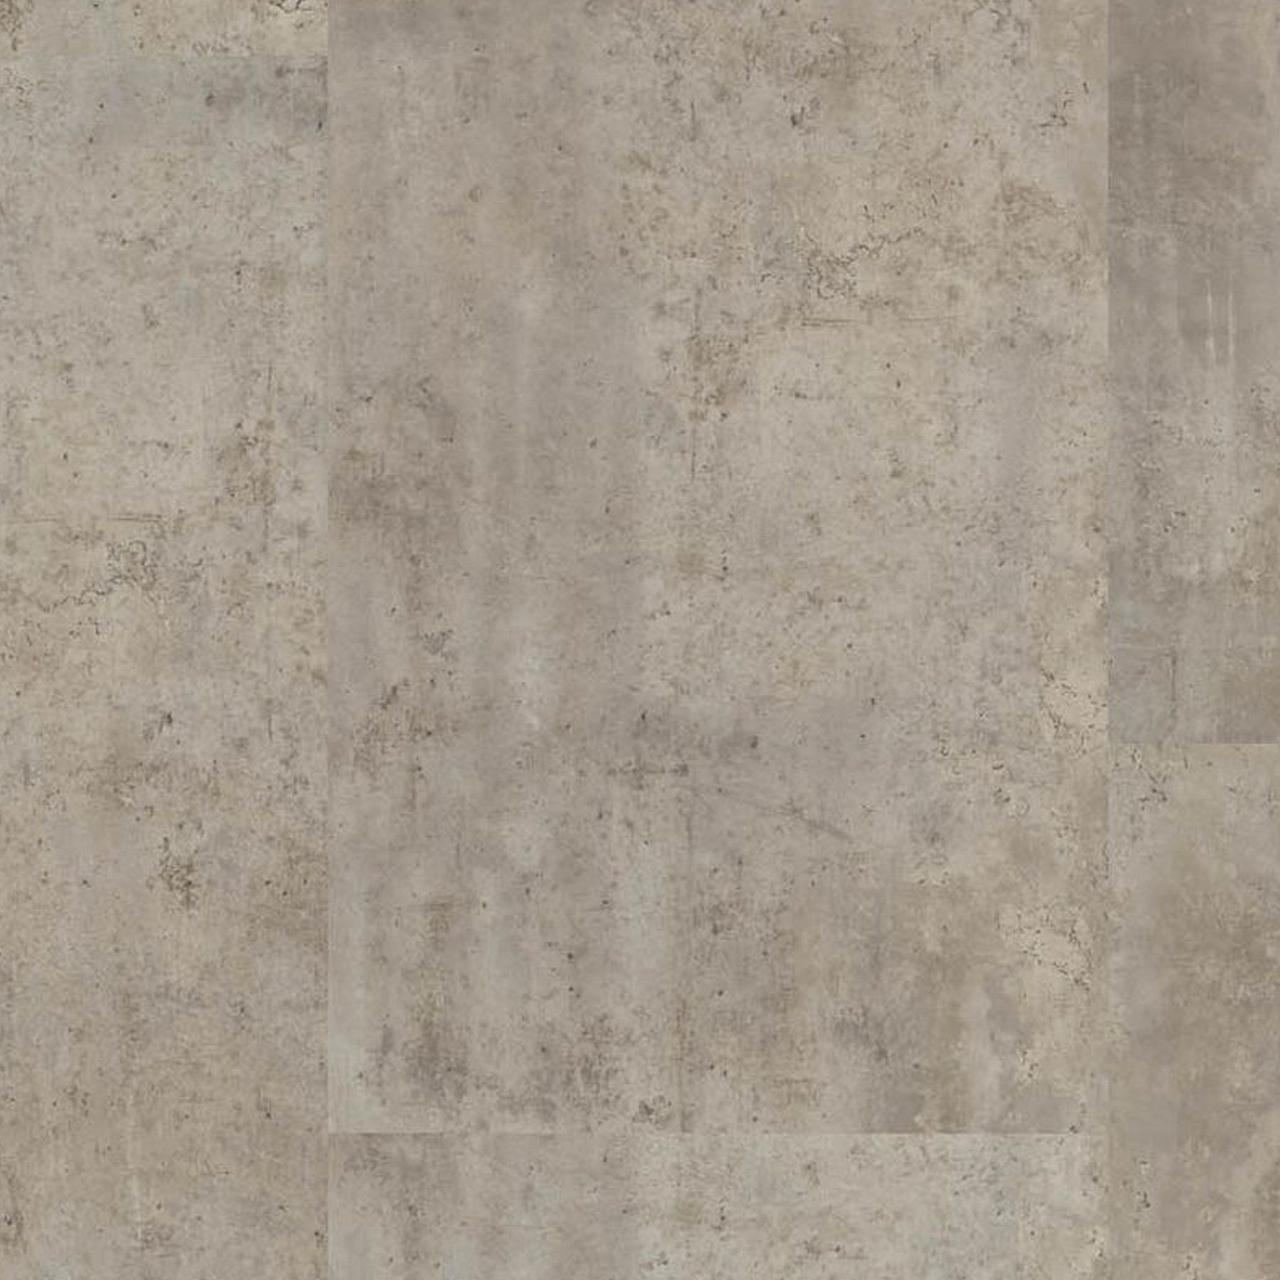 Биопол Purline Wineo 1500 PL Stone XL Just Concrete